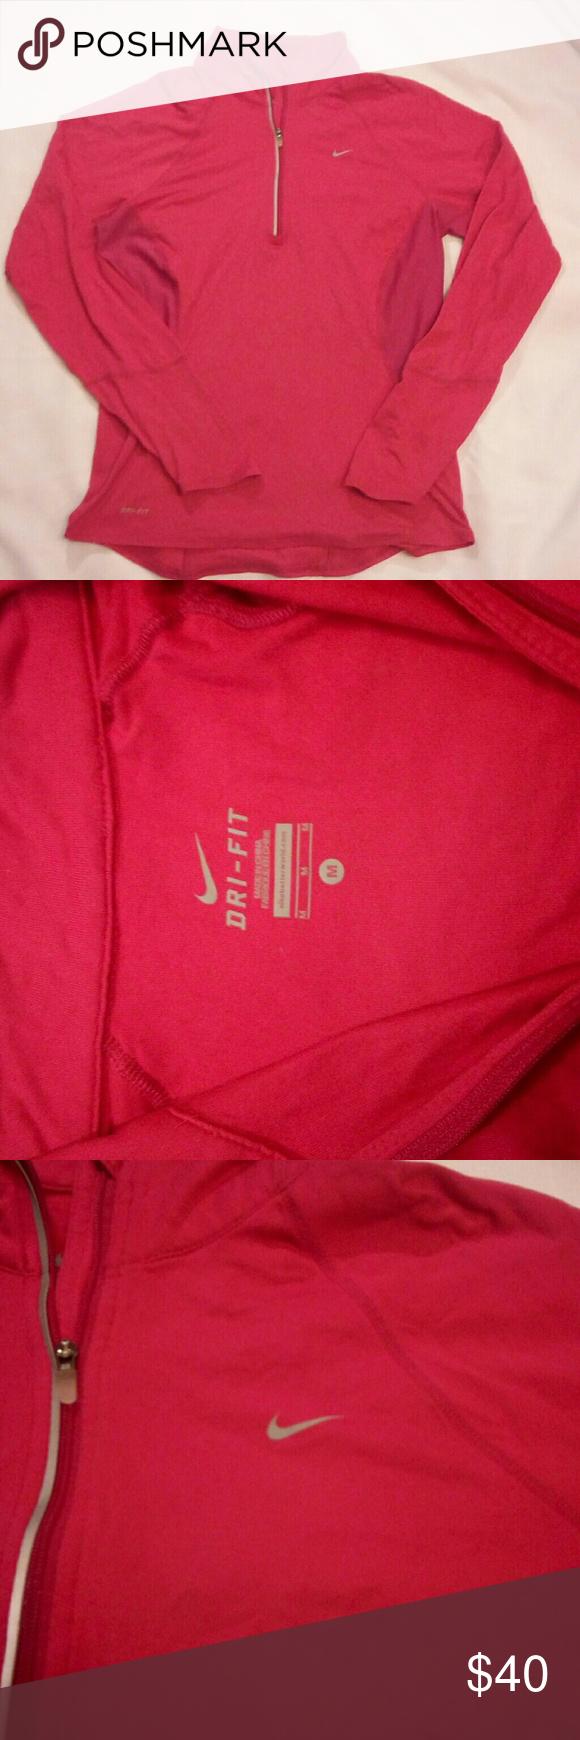 online store 25a57 2ddfe Like new - pink Nike running sweater size medium Medium Like new Hot pink  Perfect for spring Nike Nike Tops Sweatshirts   Hoodies